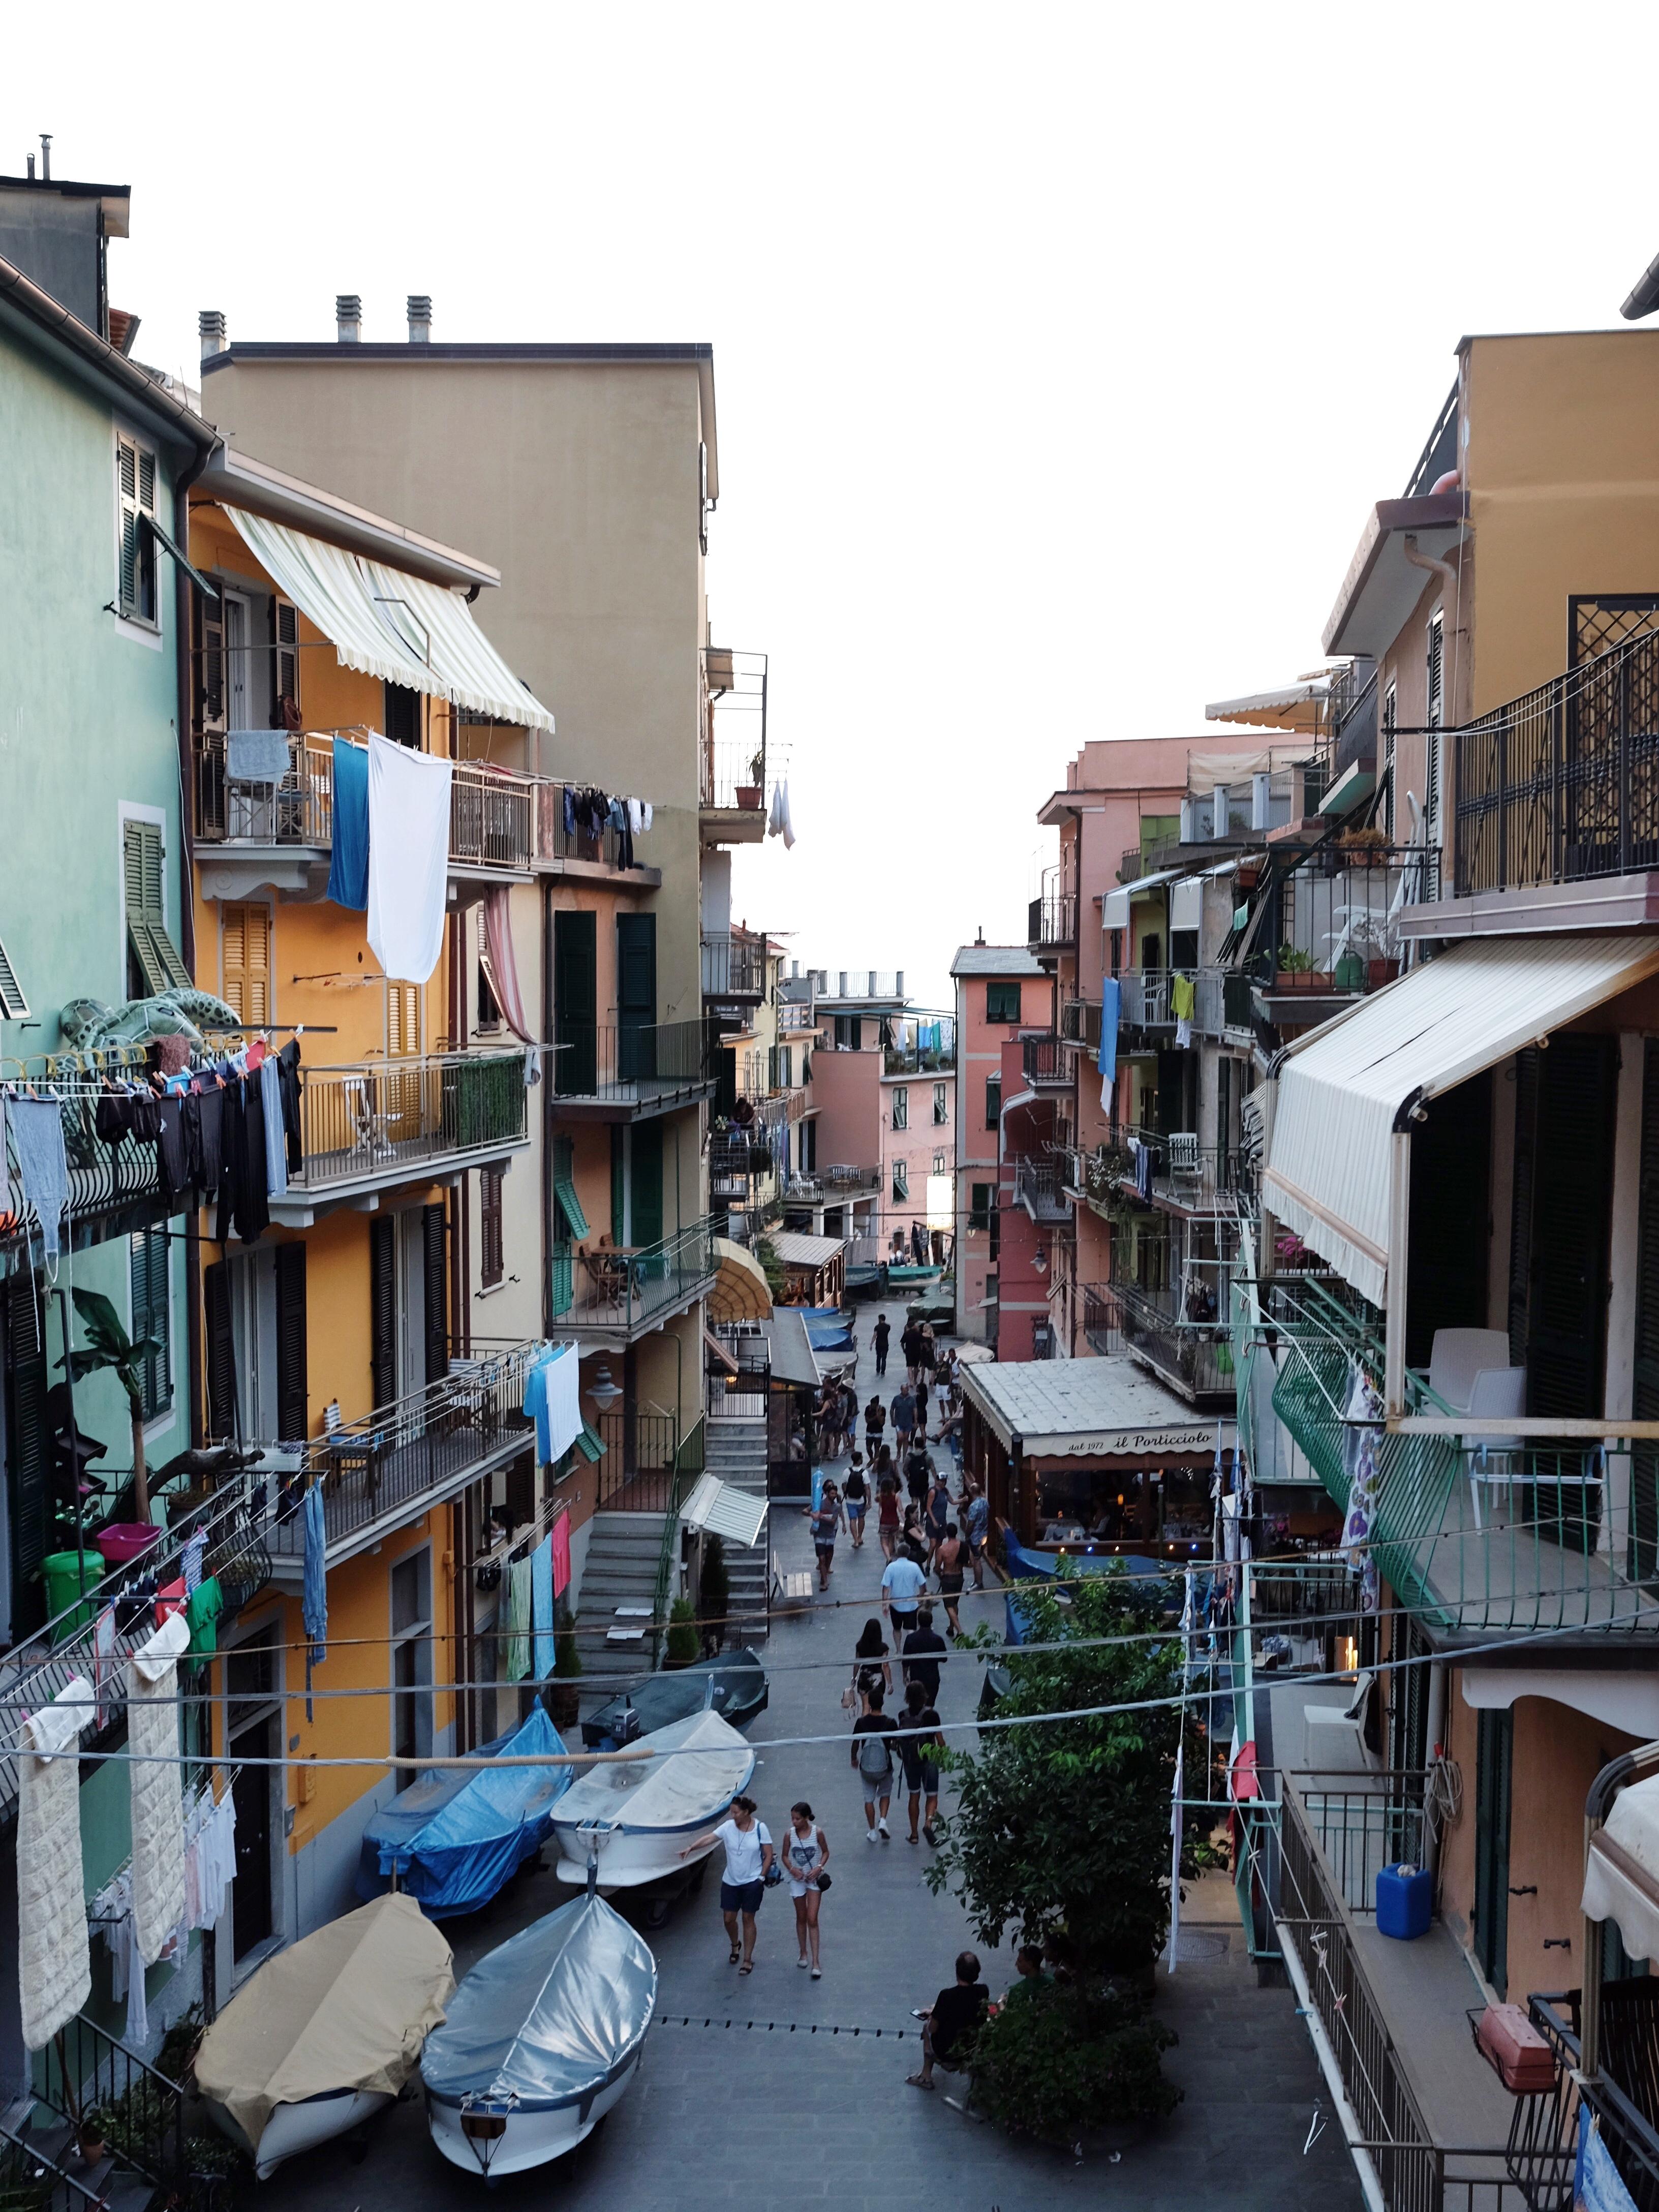 Photo Diary Cinque Terre Italy